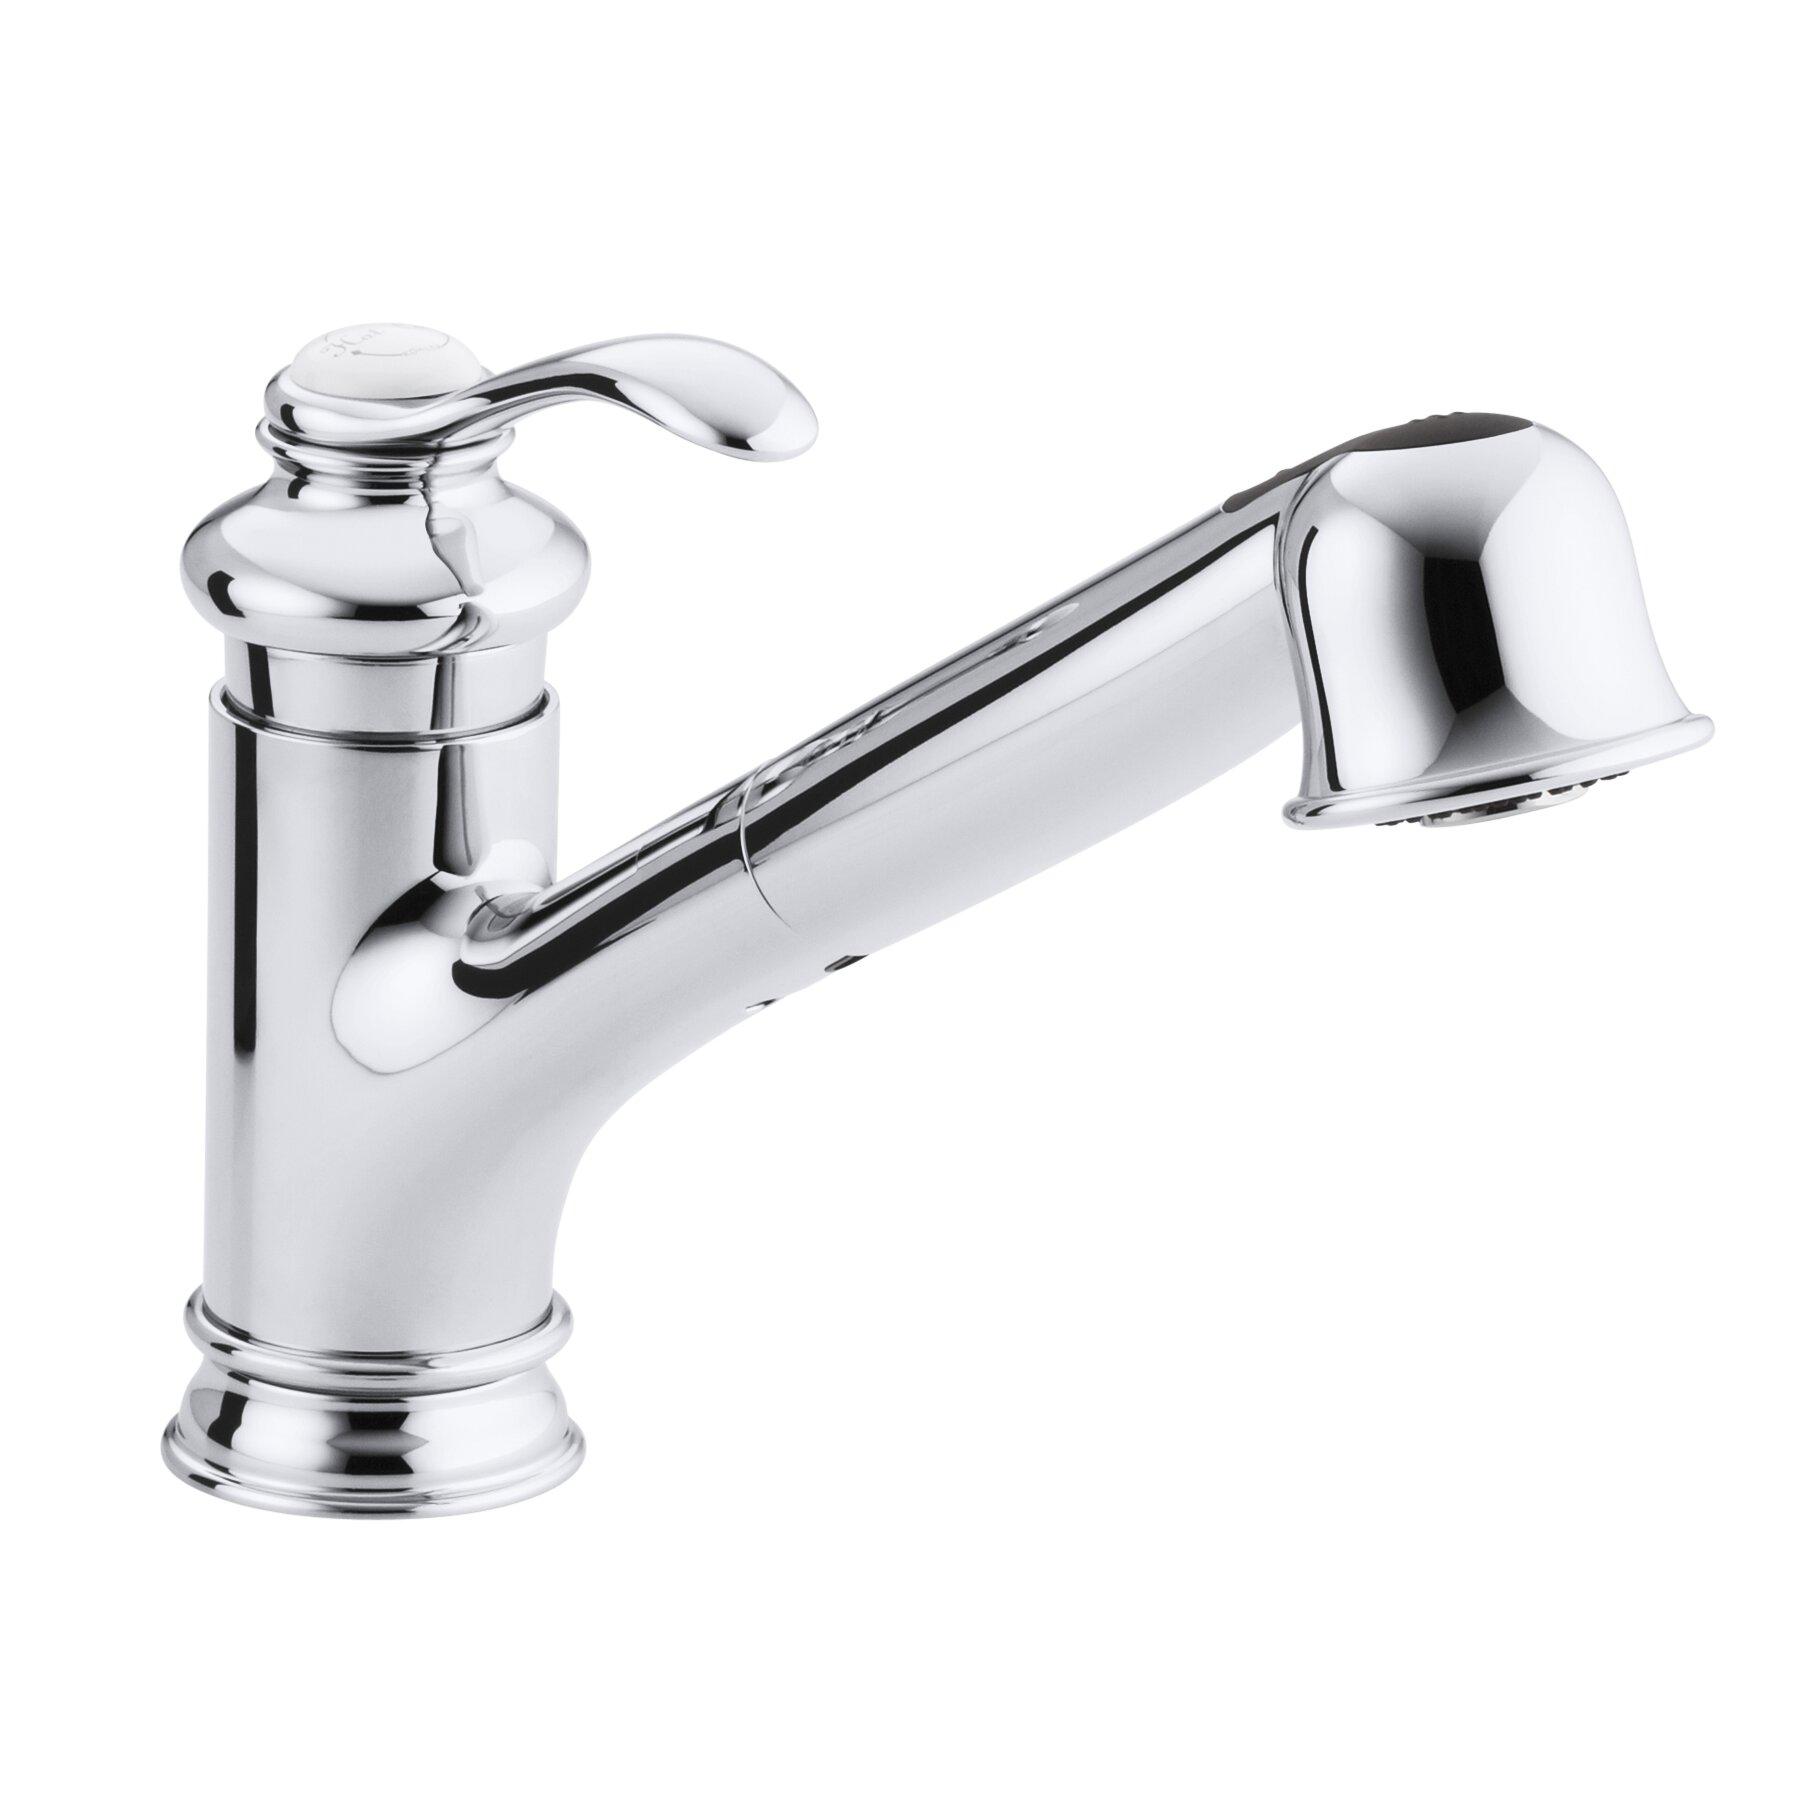 Kitchen Sink Faucets Reviews Kohler Fairfax Single Hole Or Three Hole Kitchen Sink Faucet With